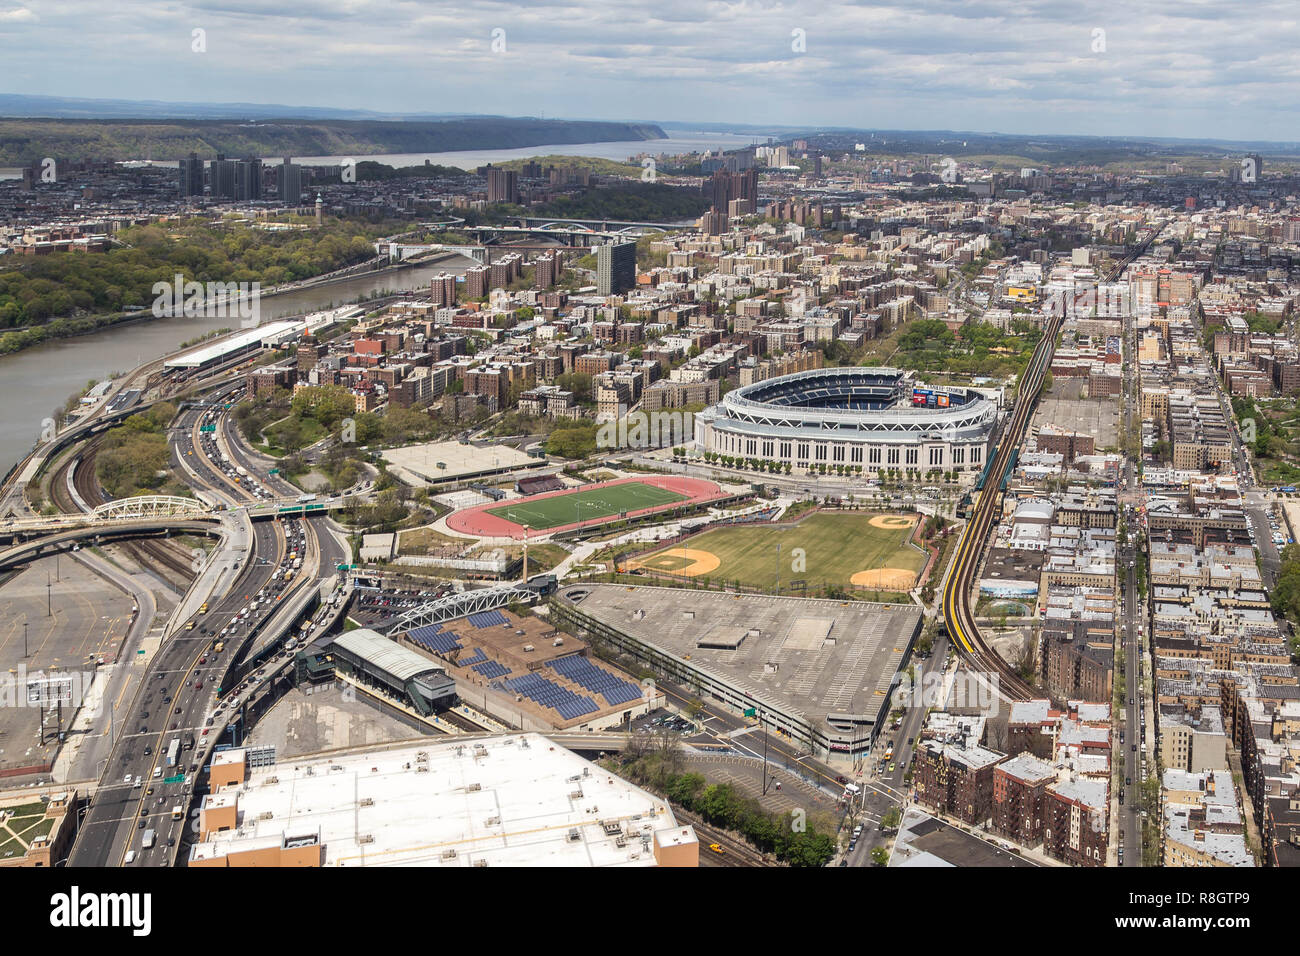 Arial view of Yankee Stadium and The Bronx - Stock Image